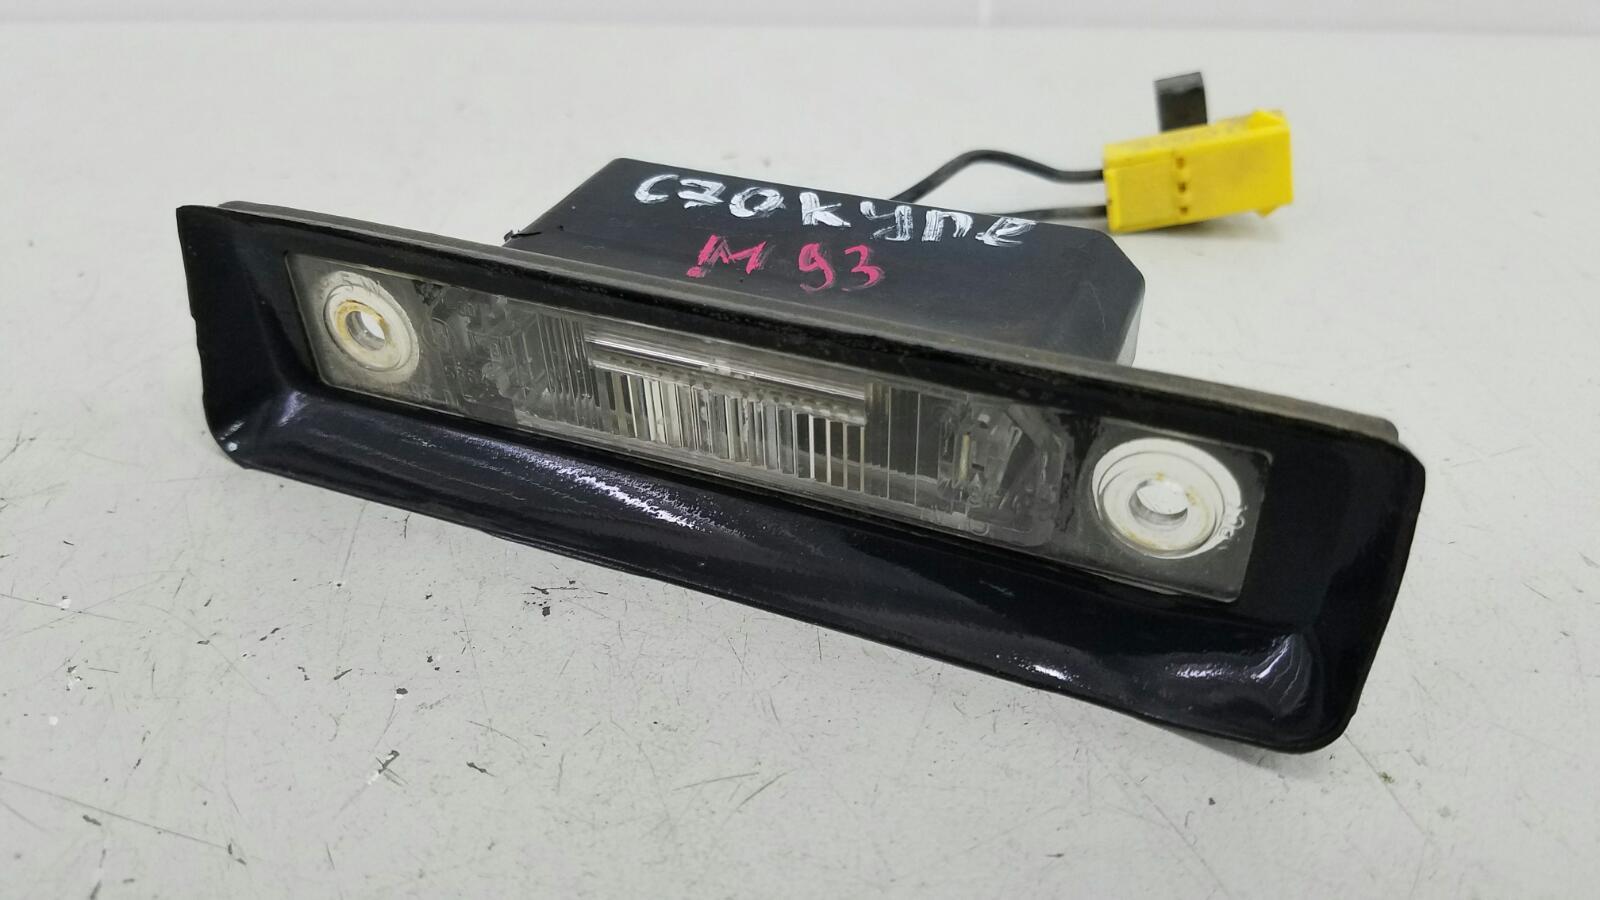 Плафон подсветки заднего номера Volvo C70 Купэ NK B5234T3 2001г